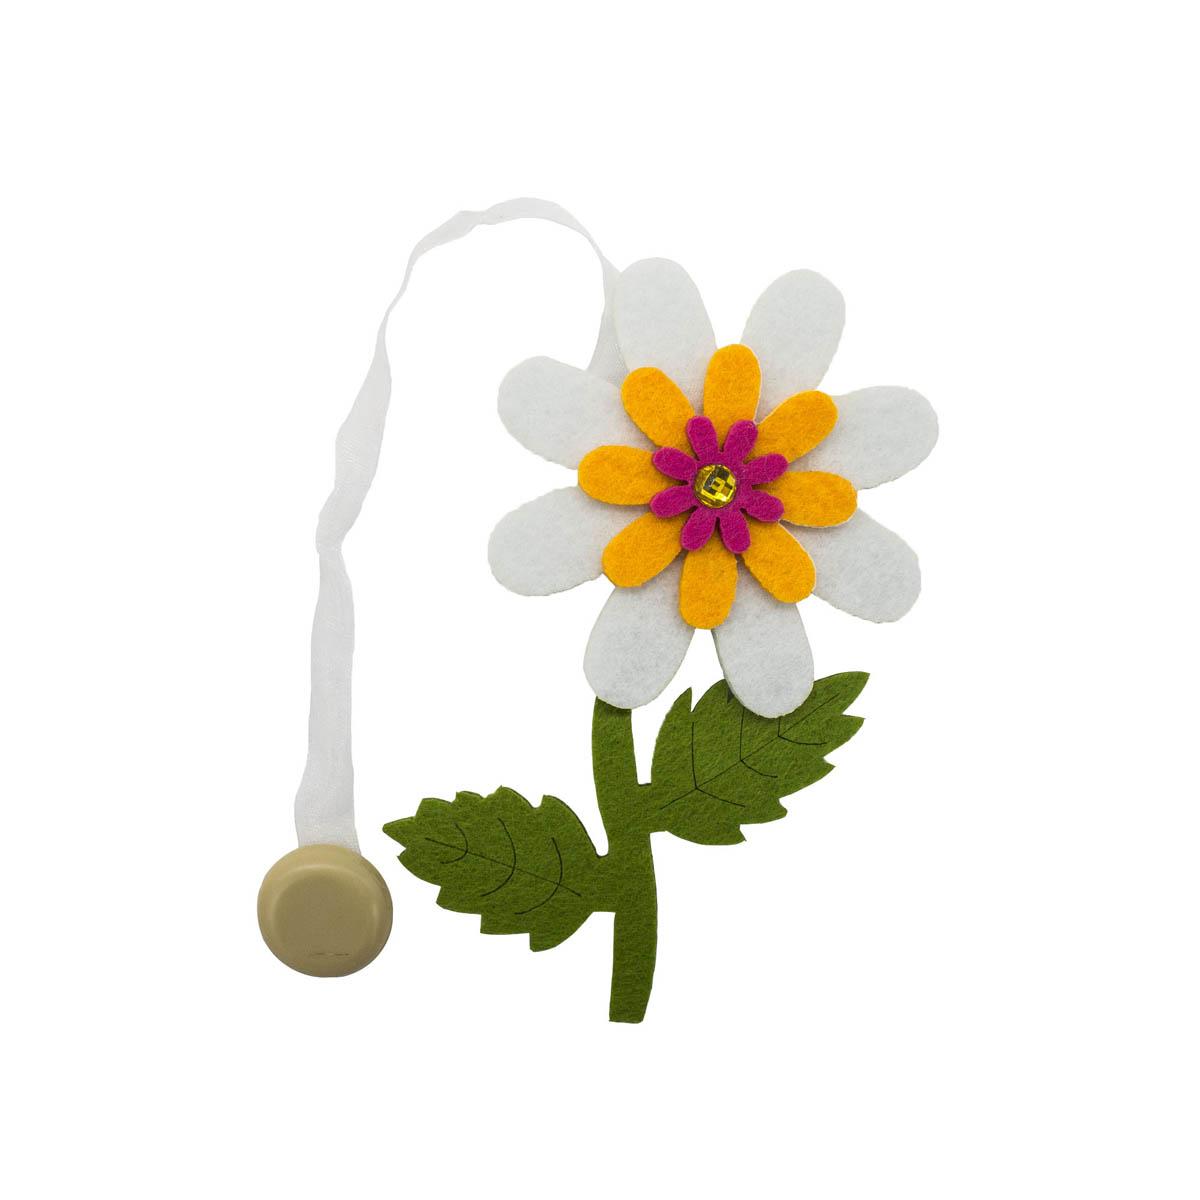 0368-0215 Клипса-магнит из фетра для штор 'цветок' 'Астра'